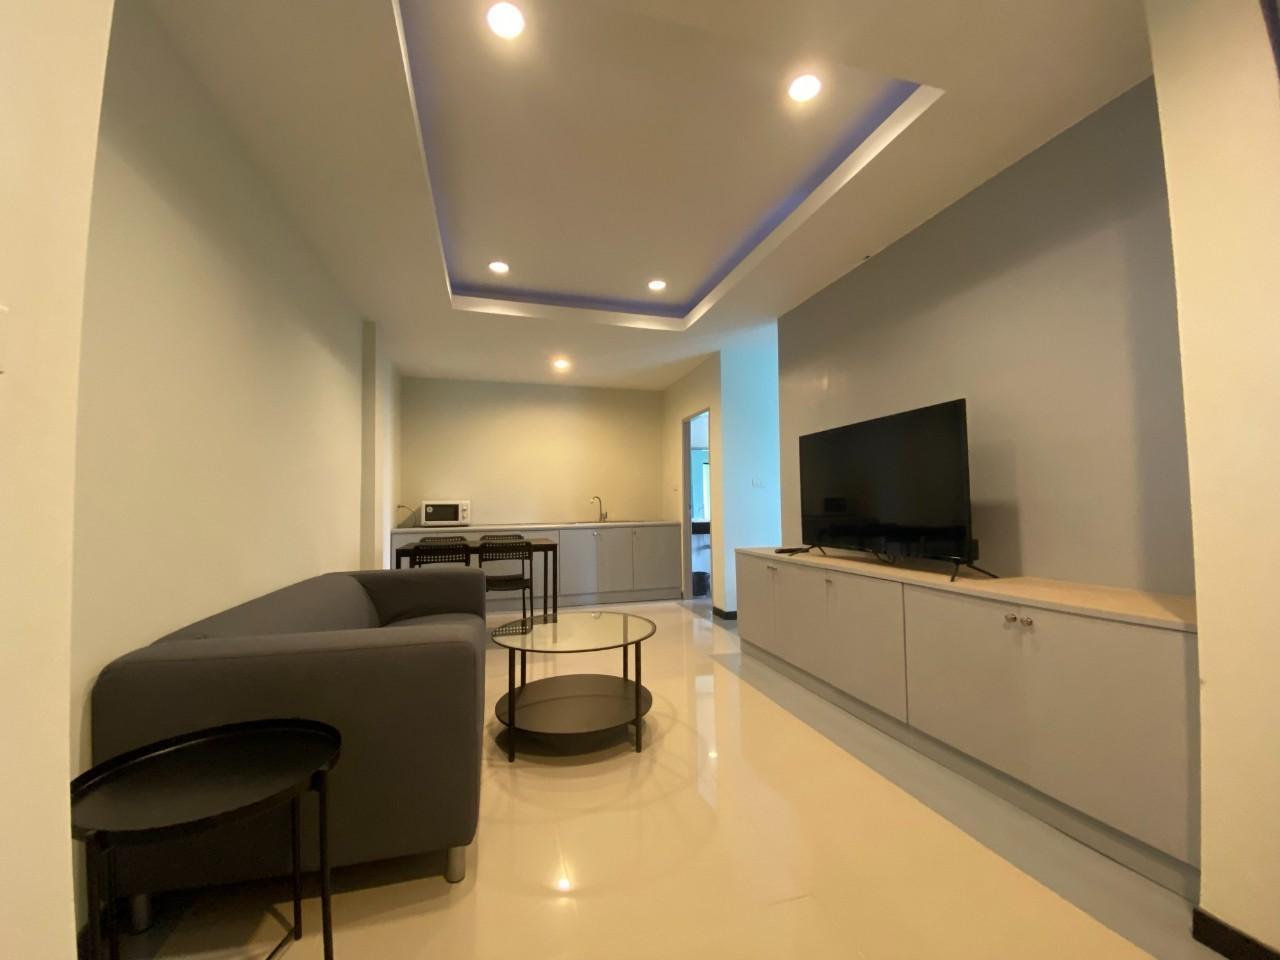 Modern w/t  Poolview near City Center@White Sand04 อพาร์ตเมนต์ 1 ห้องนอน 1 ห้องน้ำส่วนตัว ขนาด 35 ตร.ม. – ตัวเมืองภูเก็ต